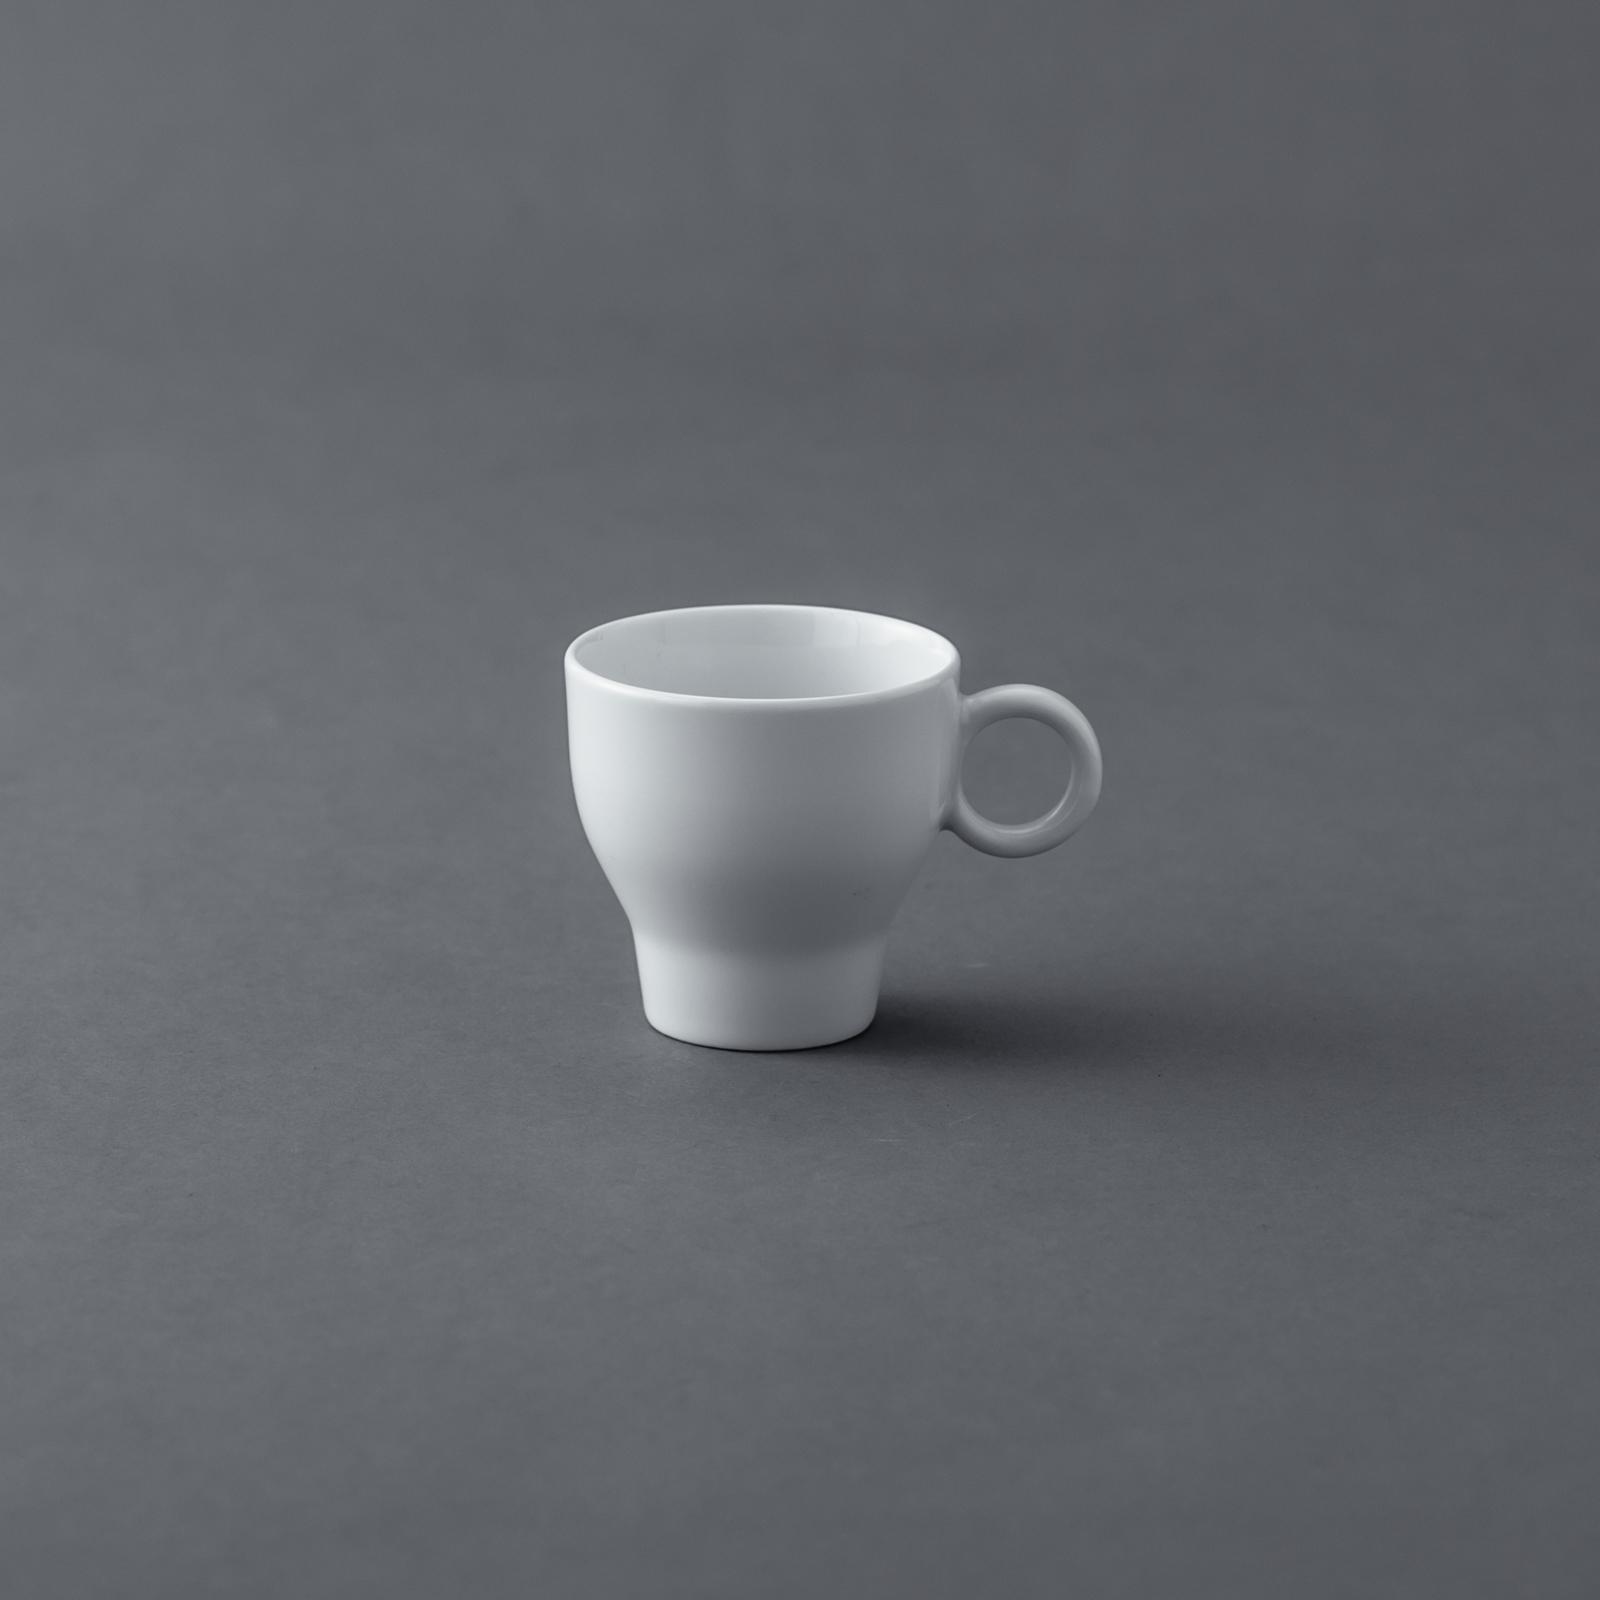 PILLIVUYT _ ルーナ モカカップ&ソーサー